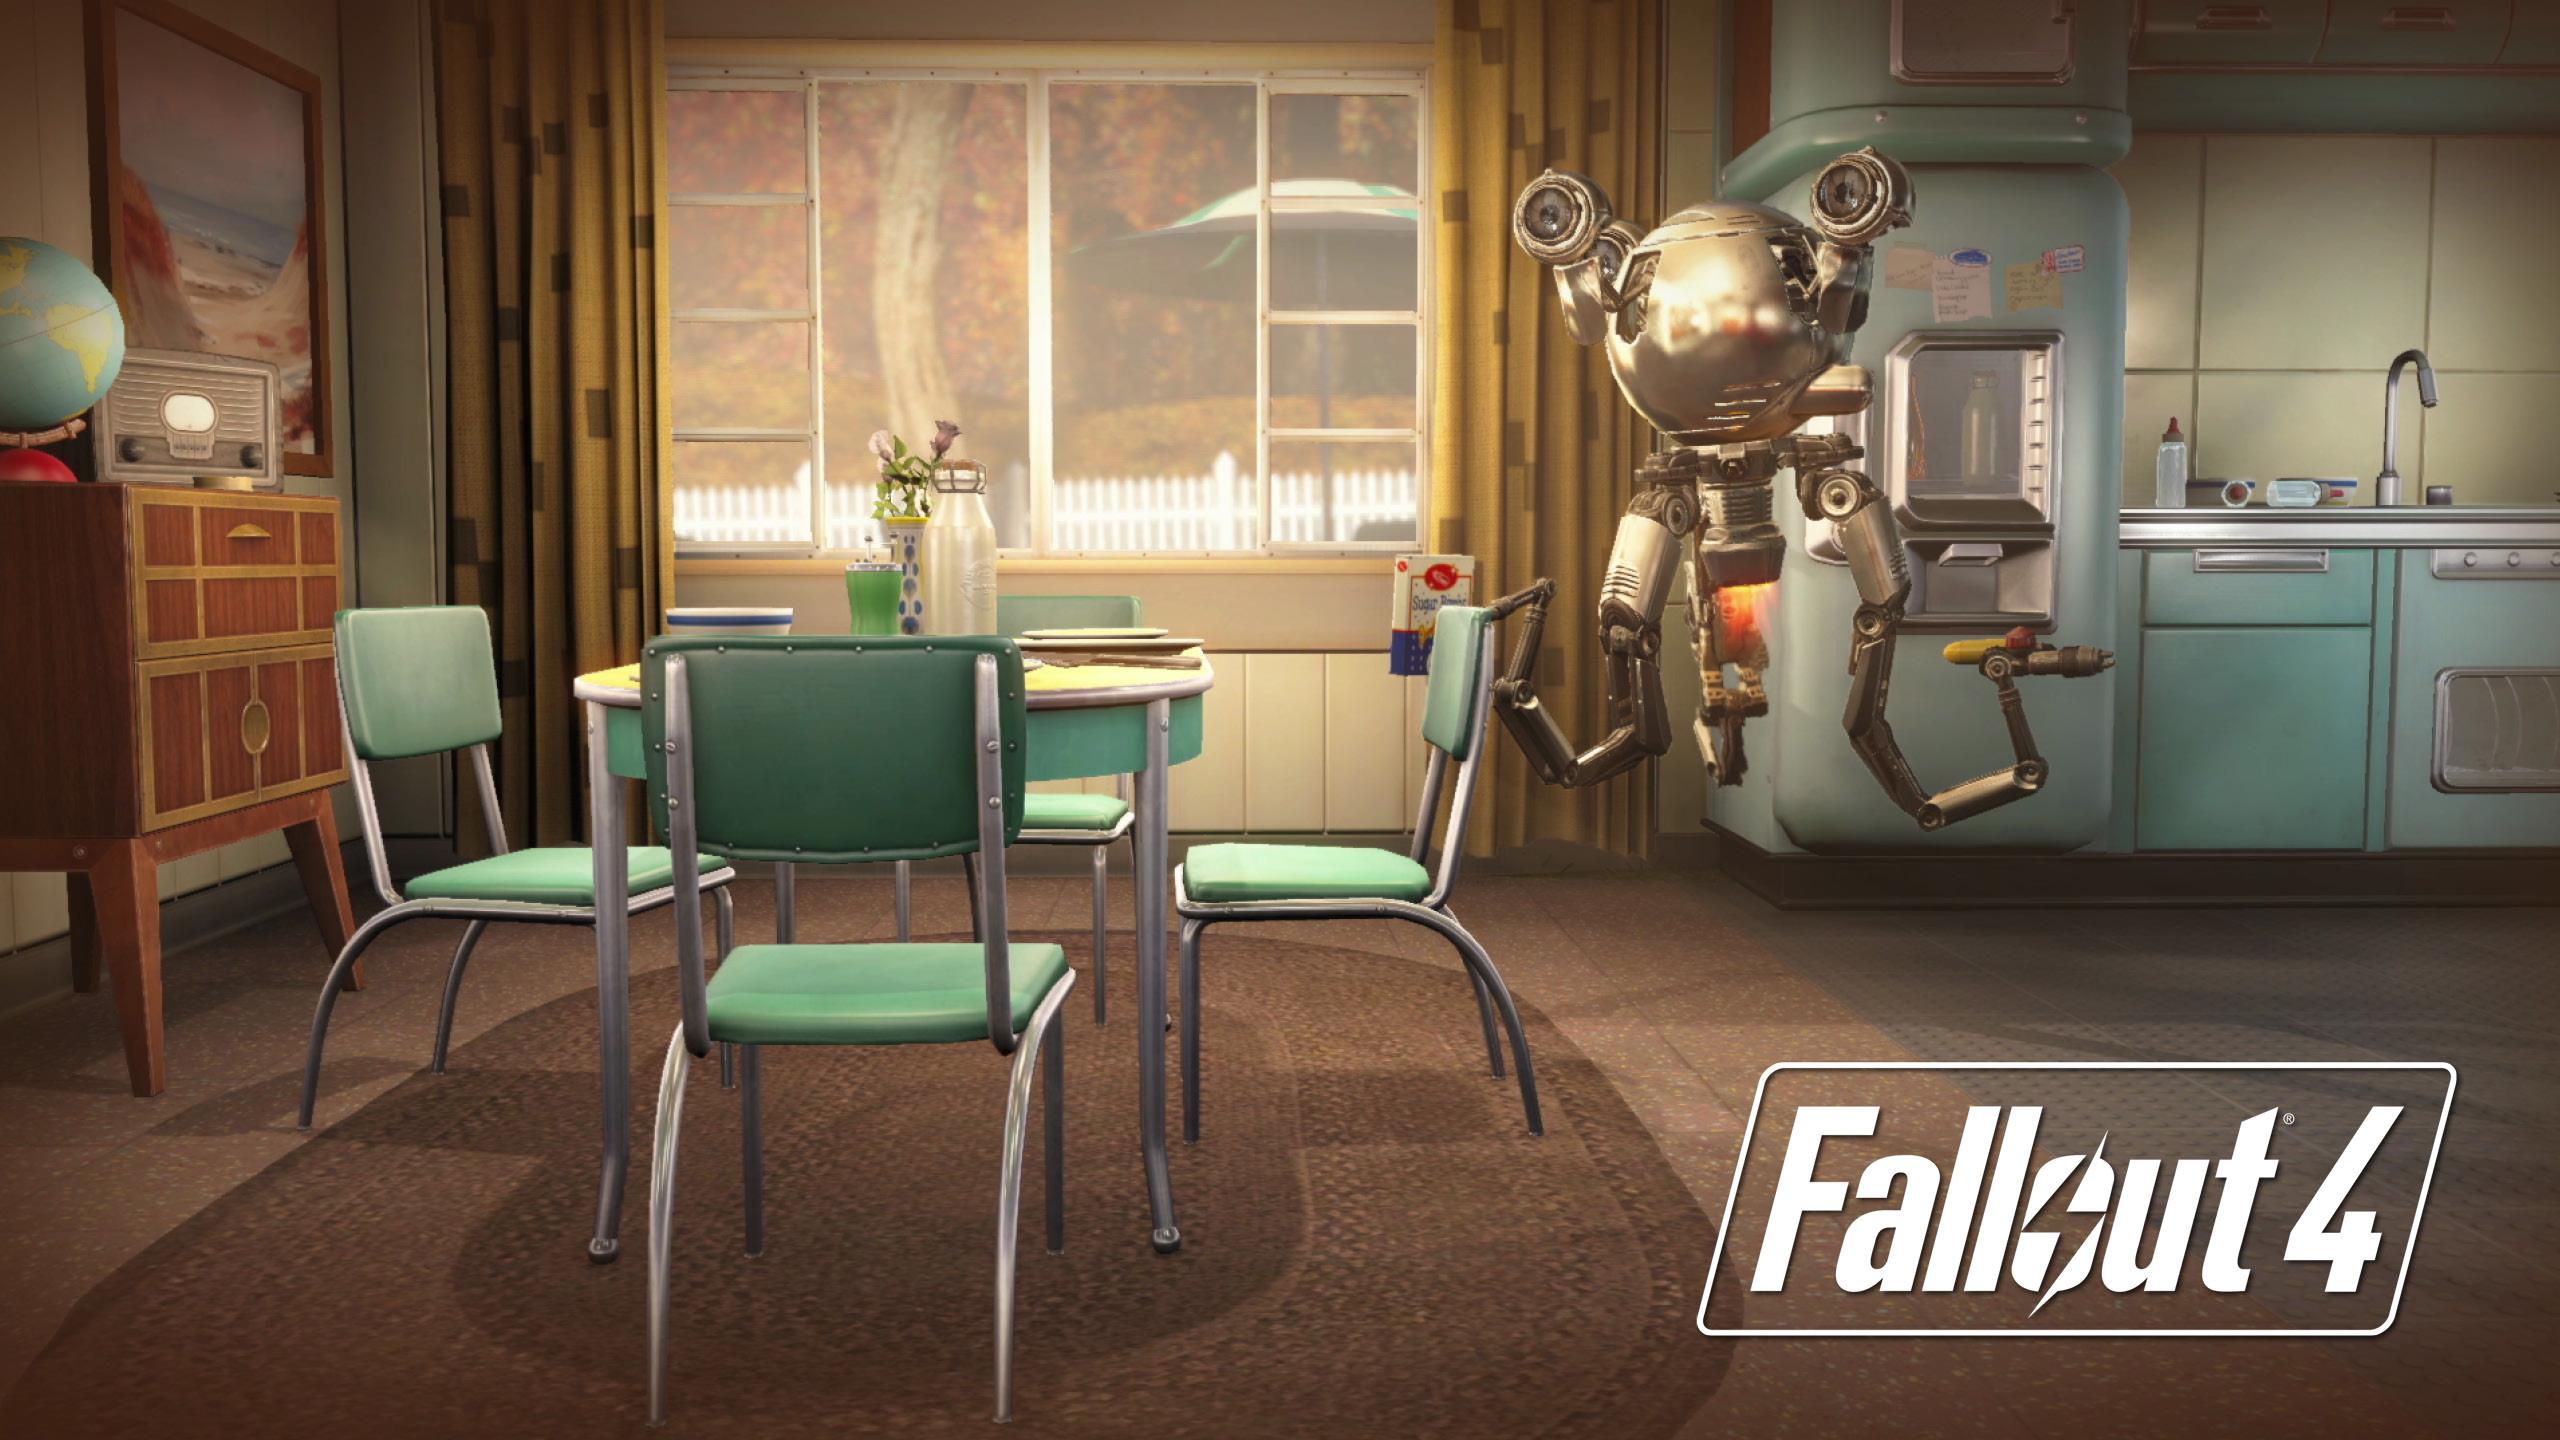 Fallout 4 HD Wallpaper Dump